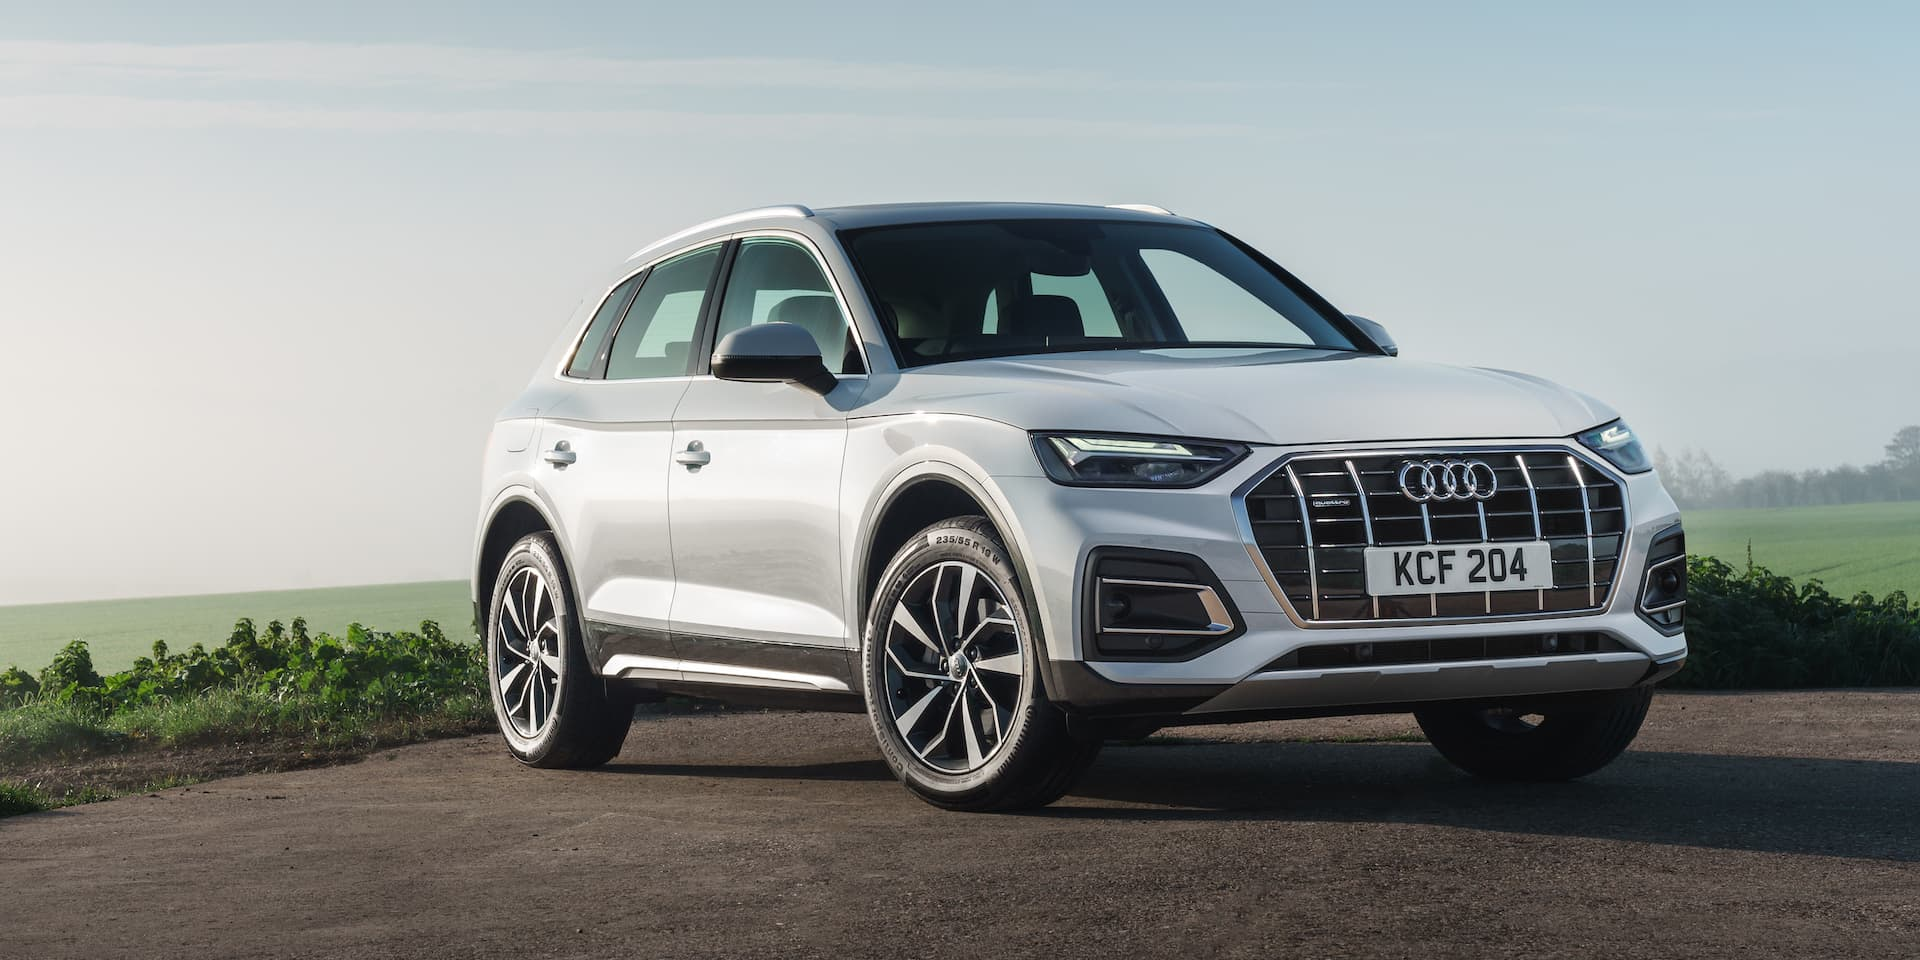 Audi Q5 (2017 onwards) –Expert Rating